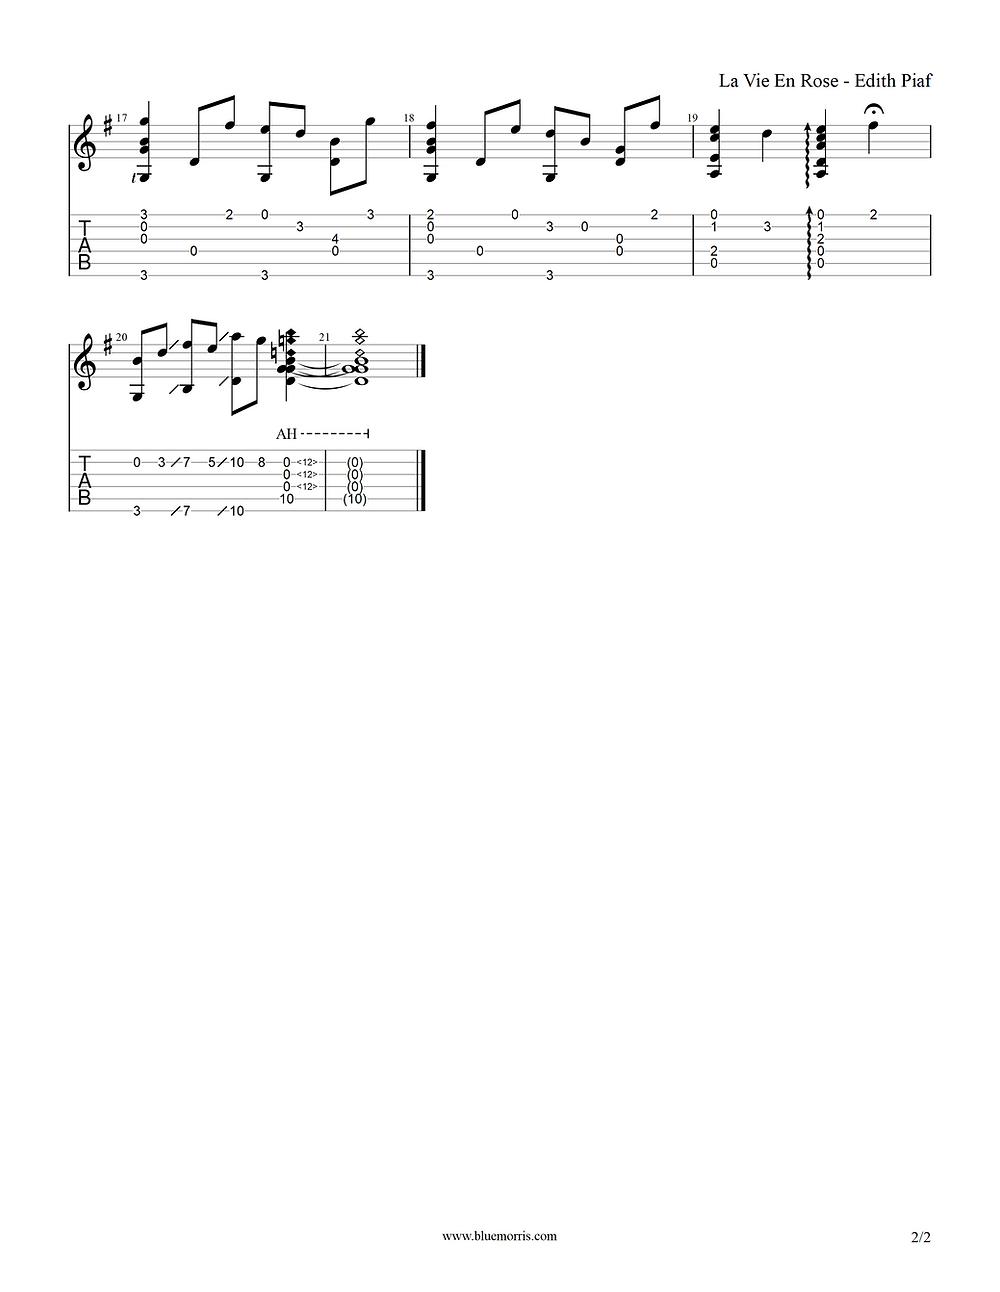 La Vie En Rose Fingerstyle guitar tab page 2